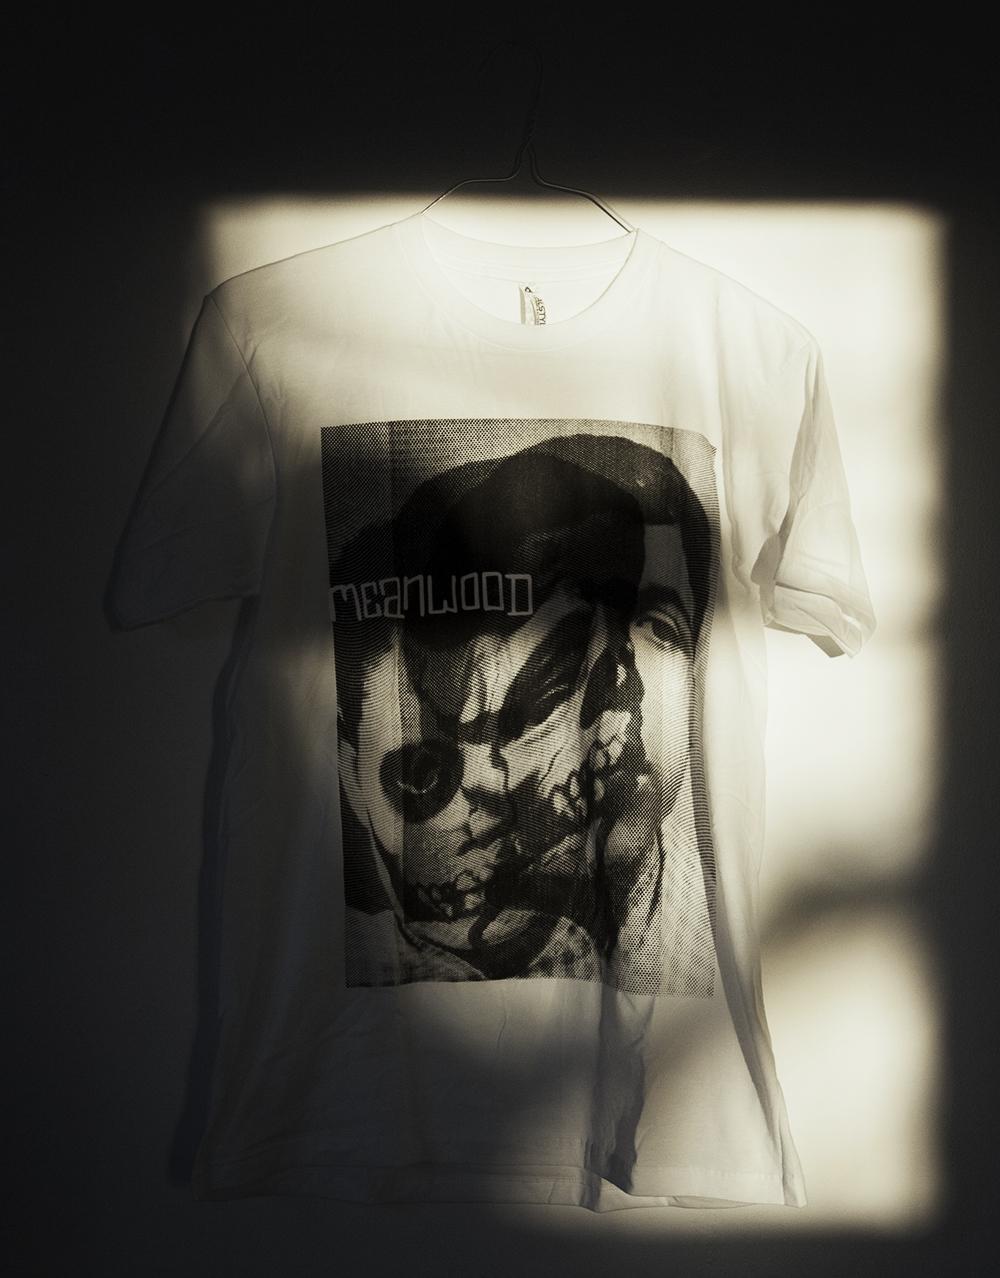 meanwood_skulls_shirt.jpg